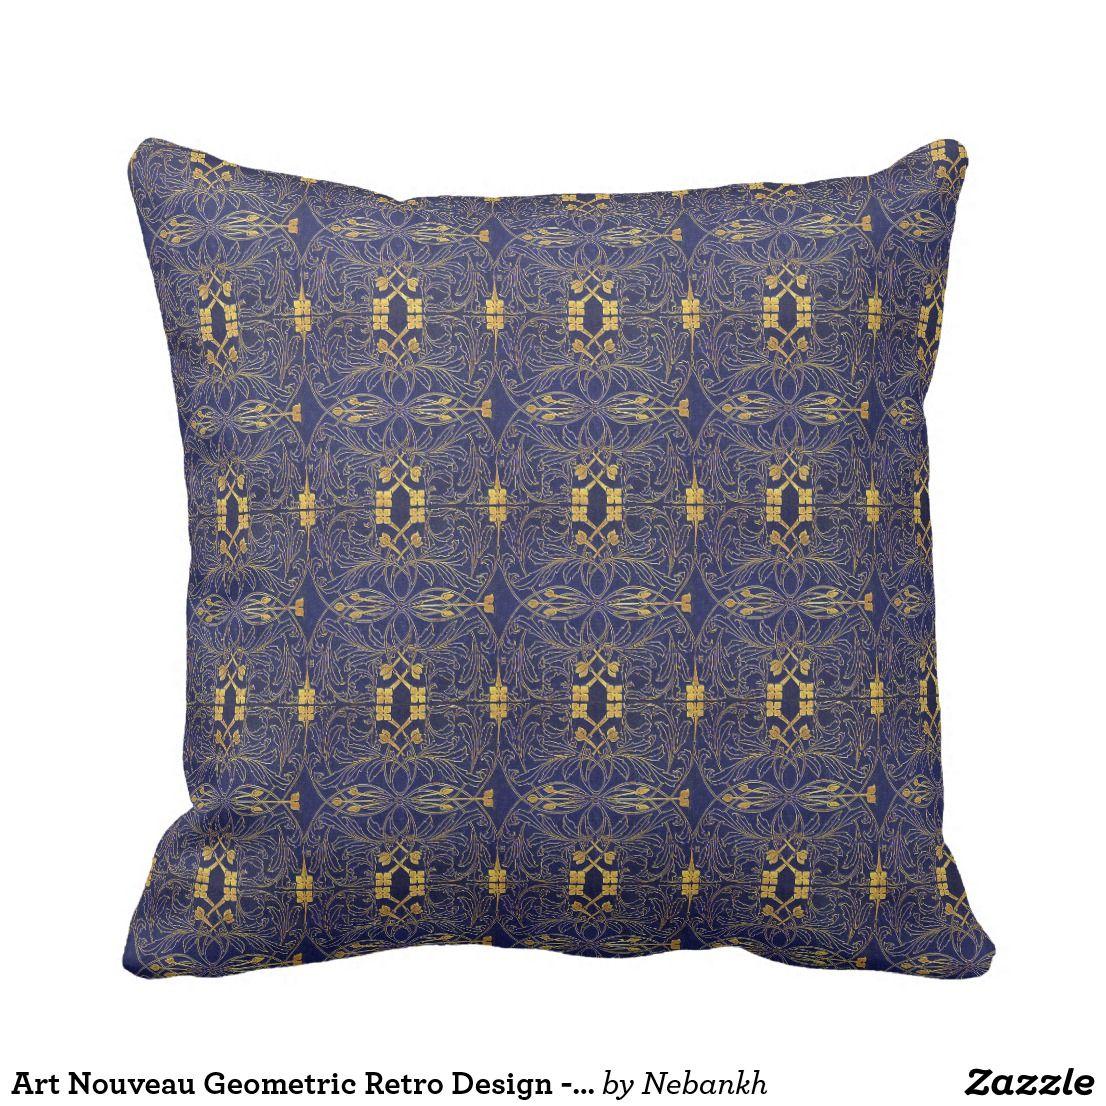 Art nouveau geometric retro design blue cushion my zazzle